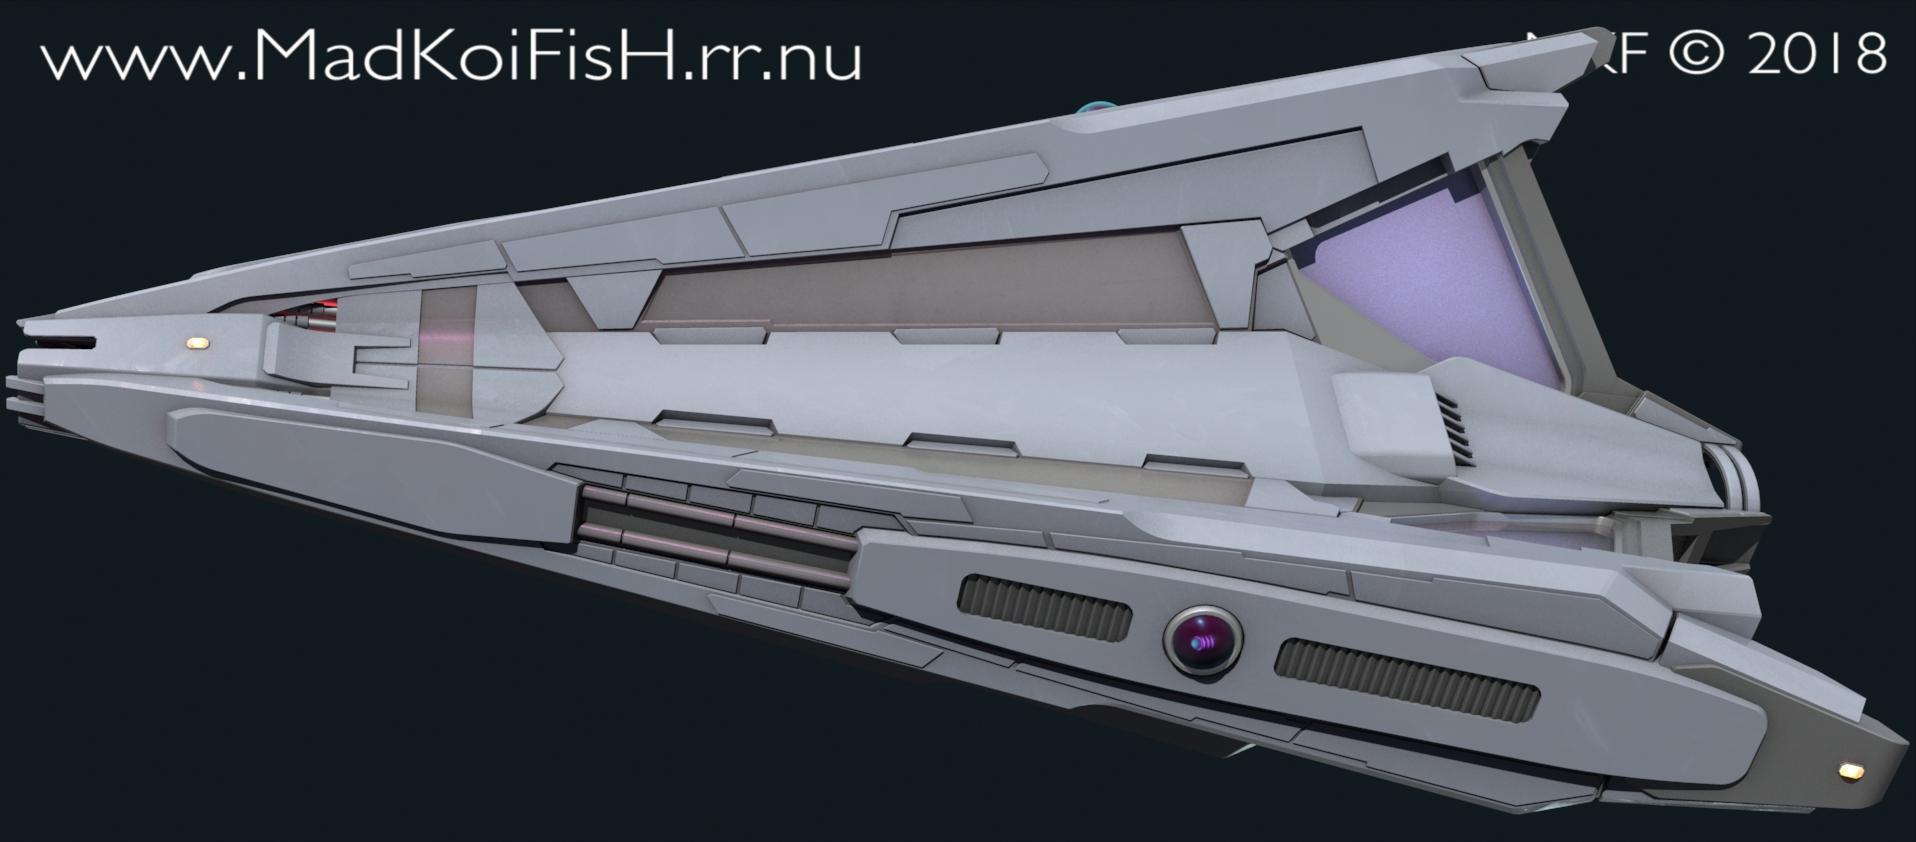 tholian-cruiser-041.jpg